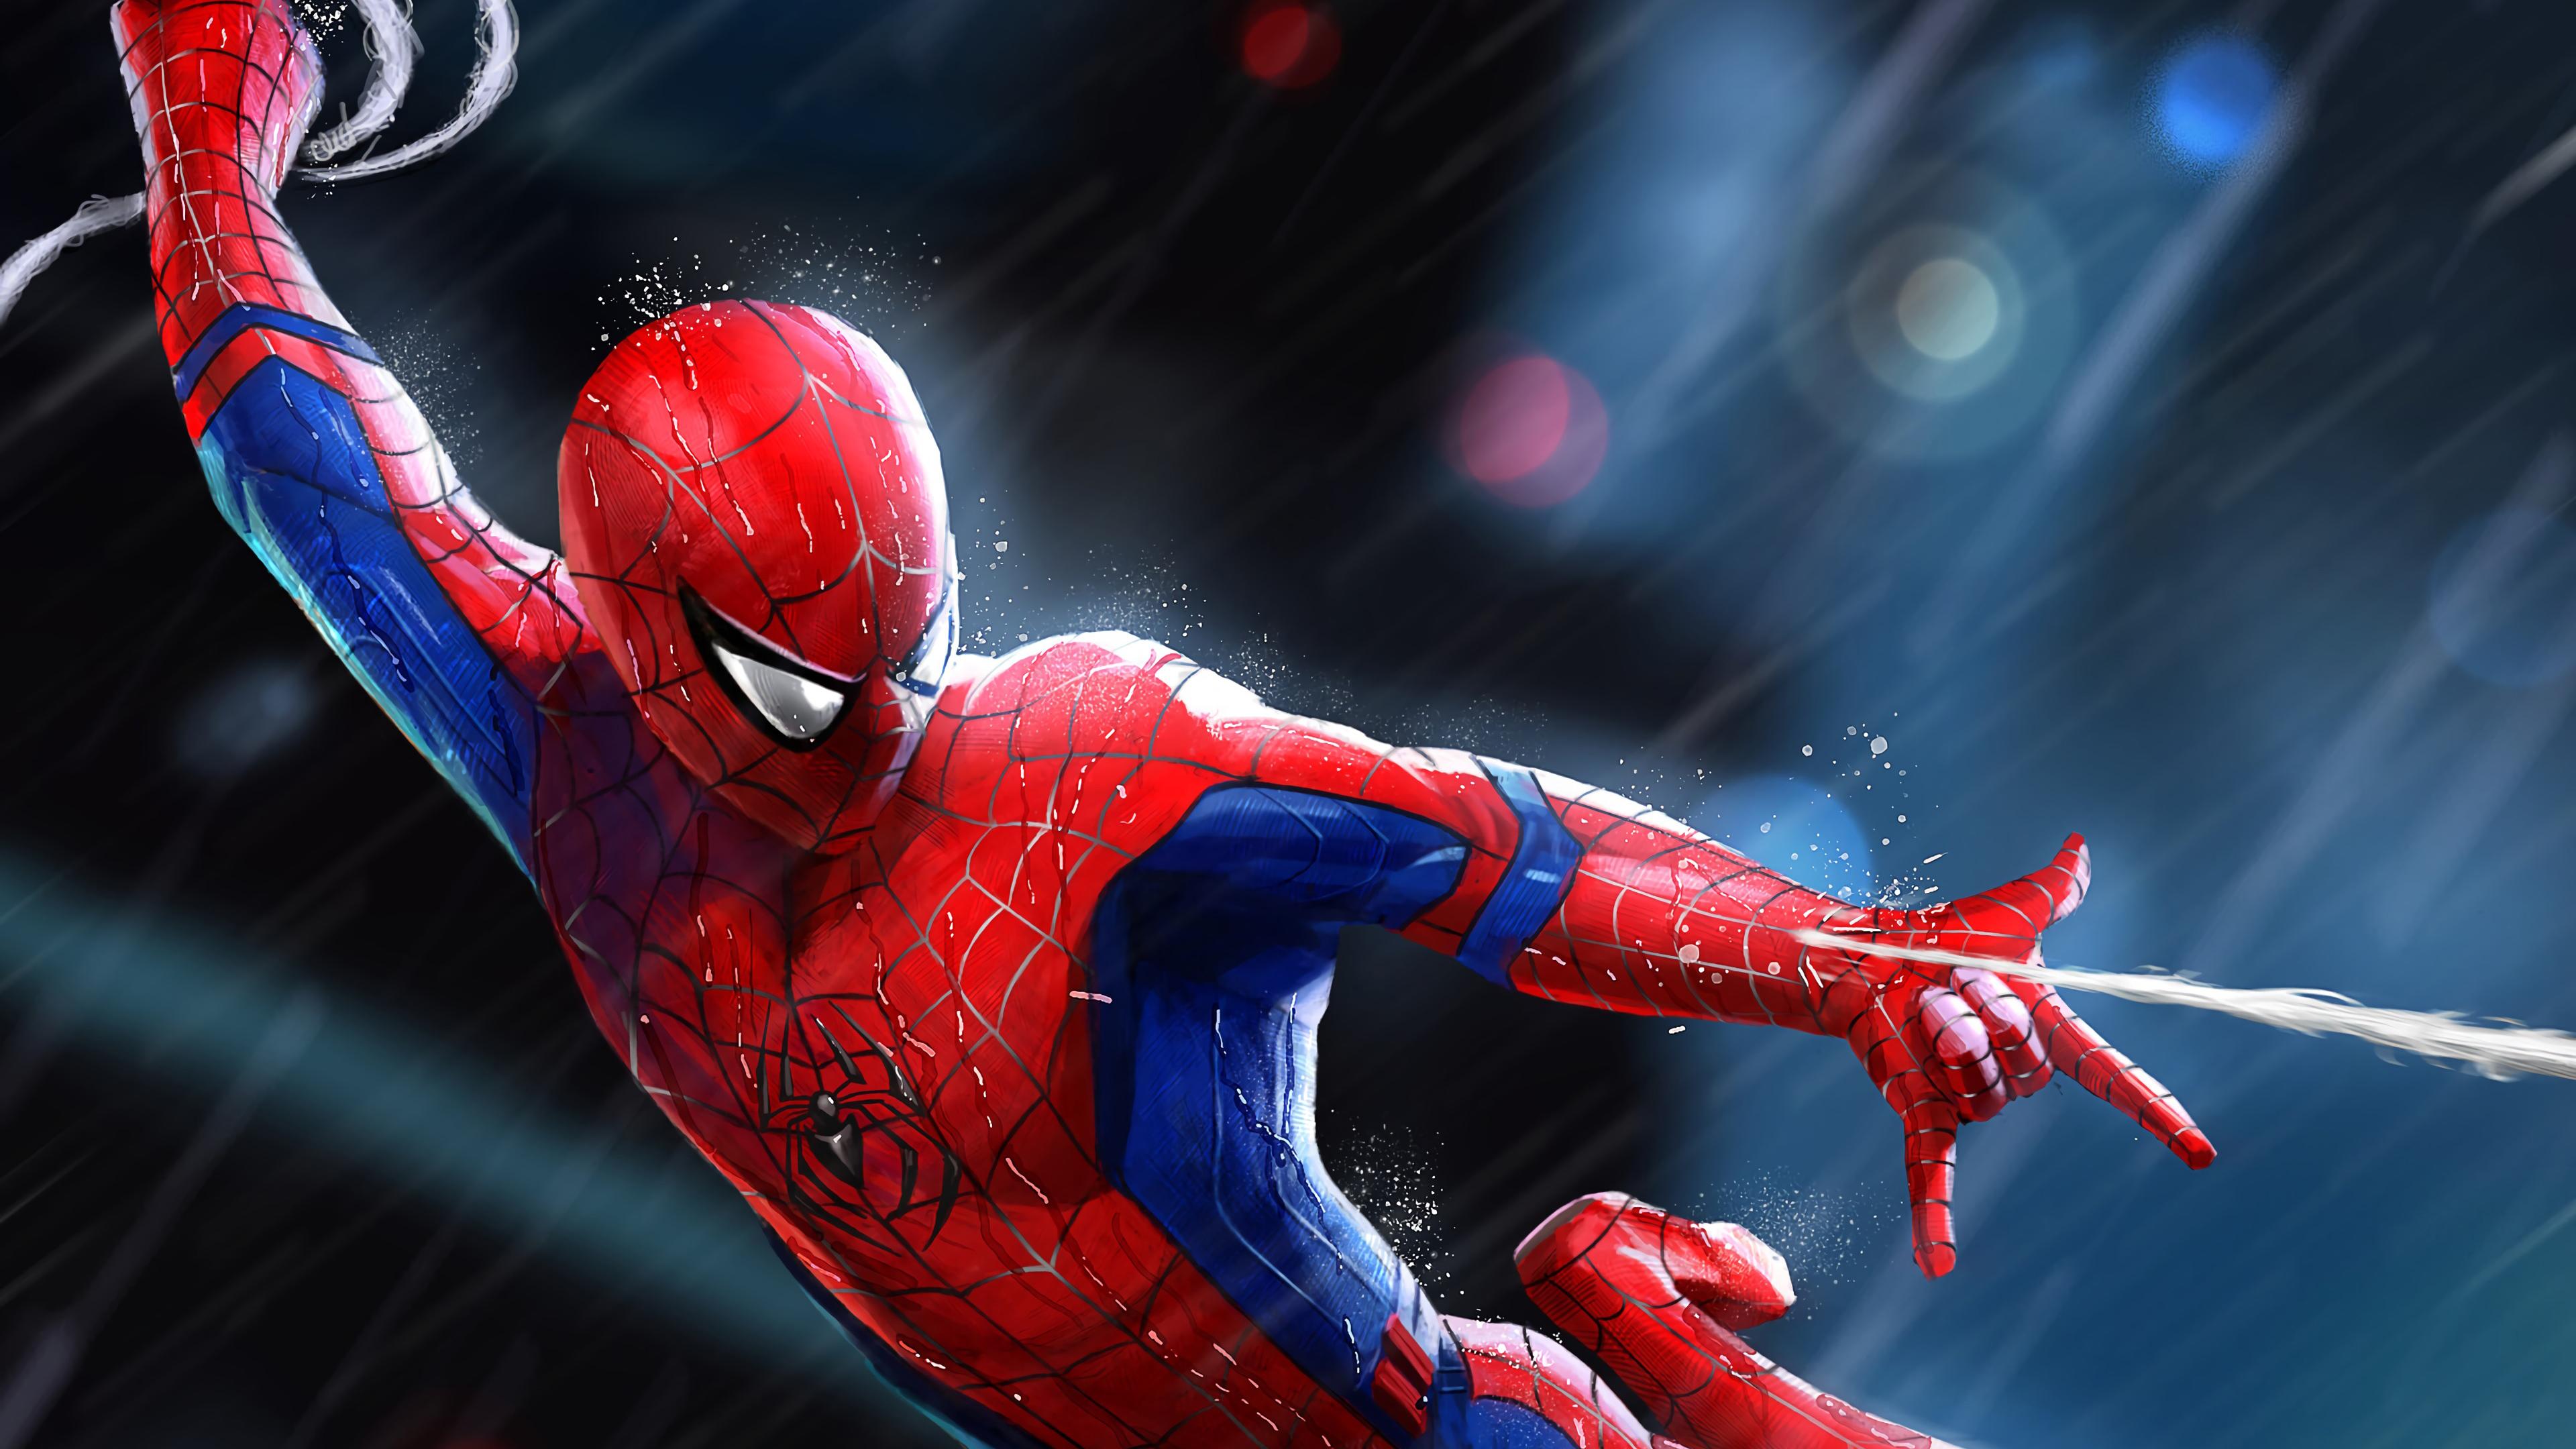 spiderman art 1568055516 - Spiderman Art - superheroes wallpapers, spiderman wallpapers, hd-wallpapers, digital art wallpapers, deviantart wallpapers, artwork wallpapers, art wallpapers, 4k-wallpapers